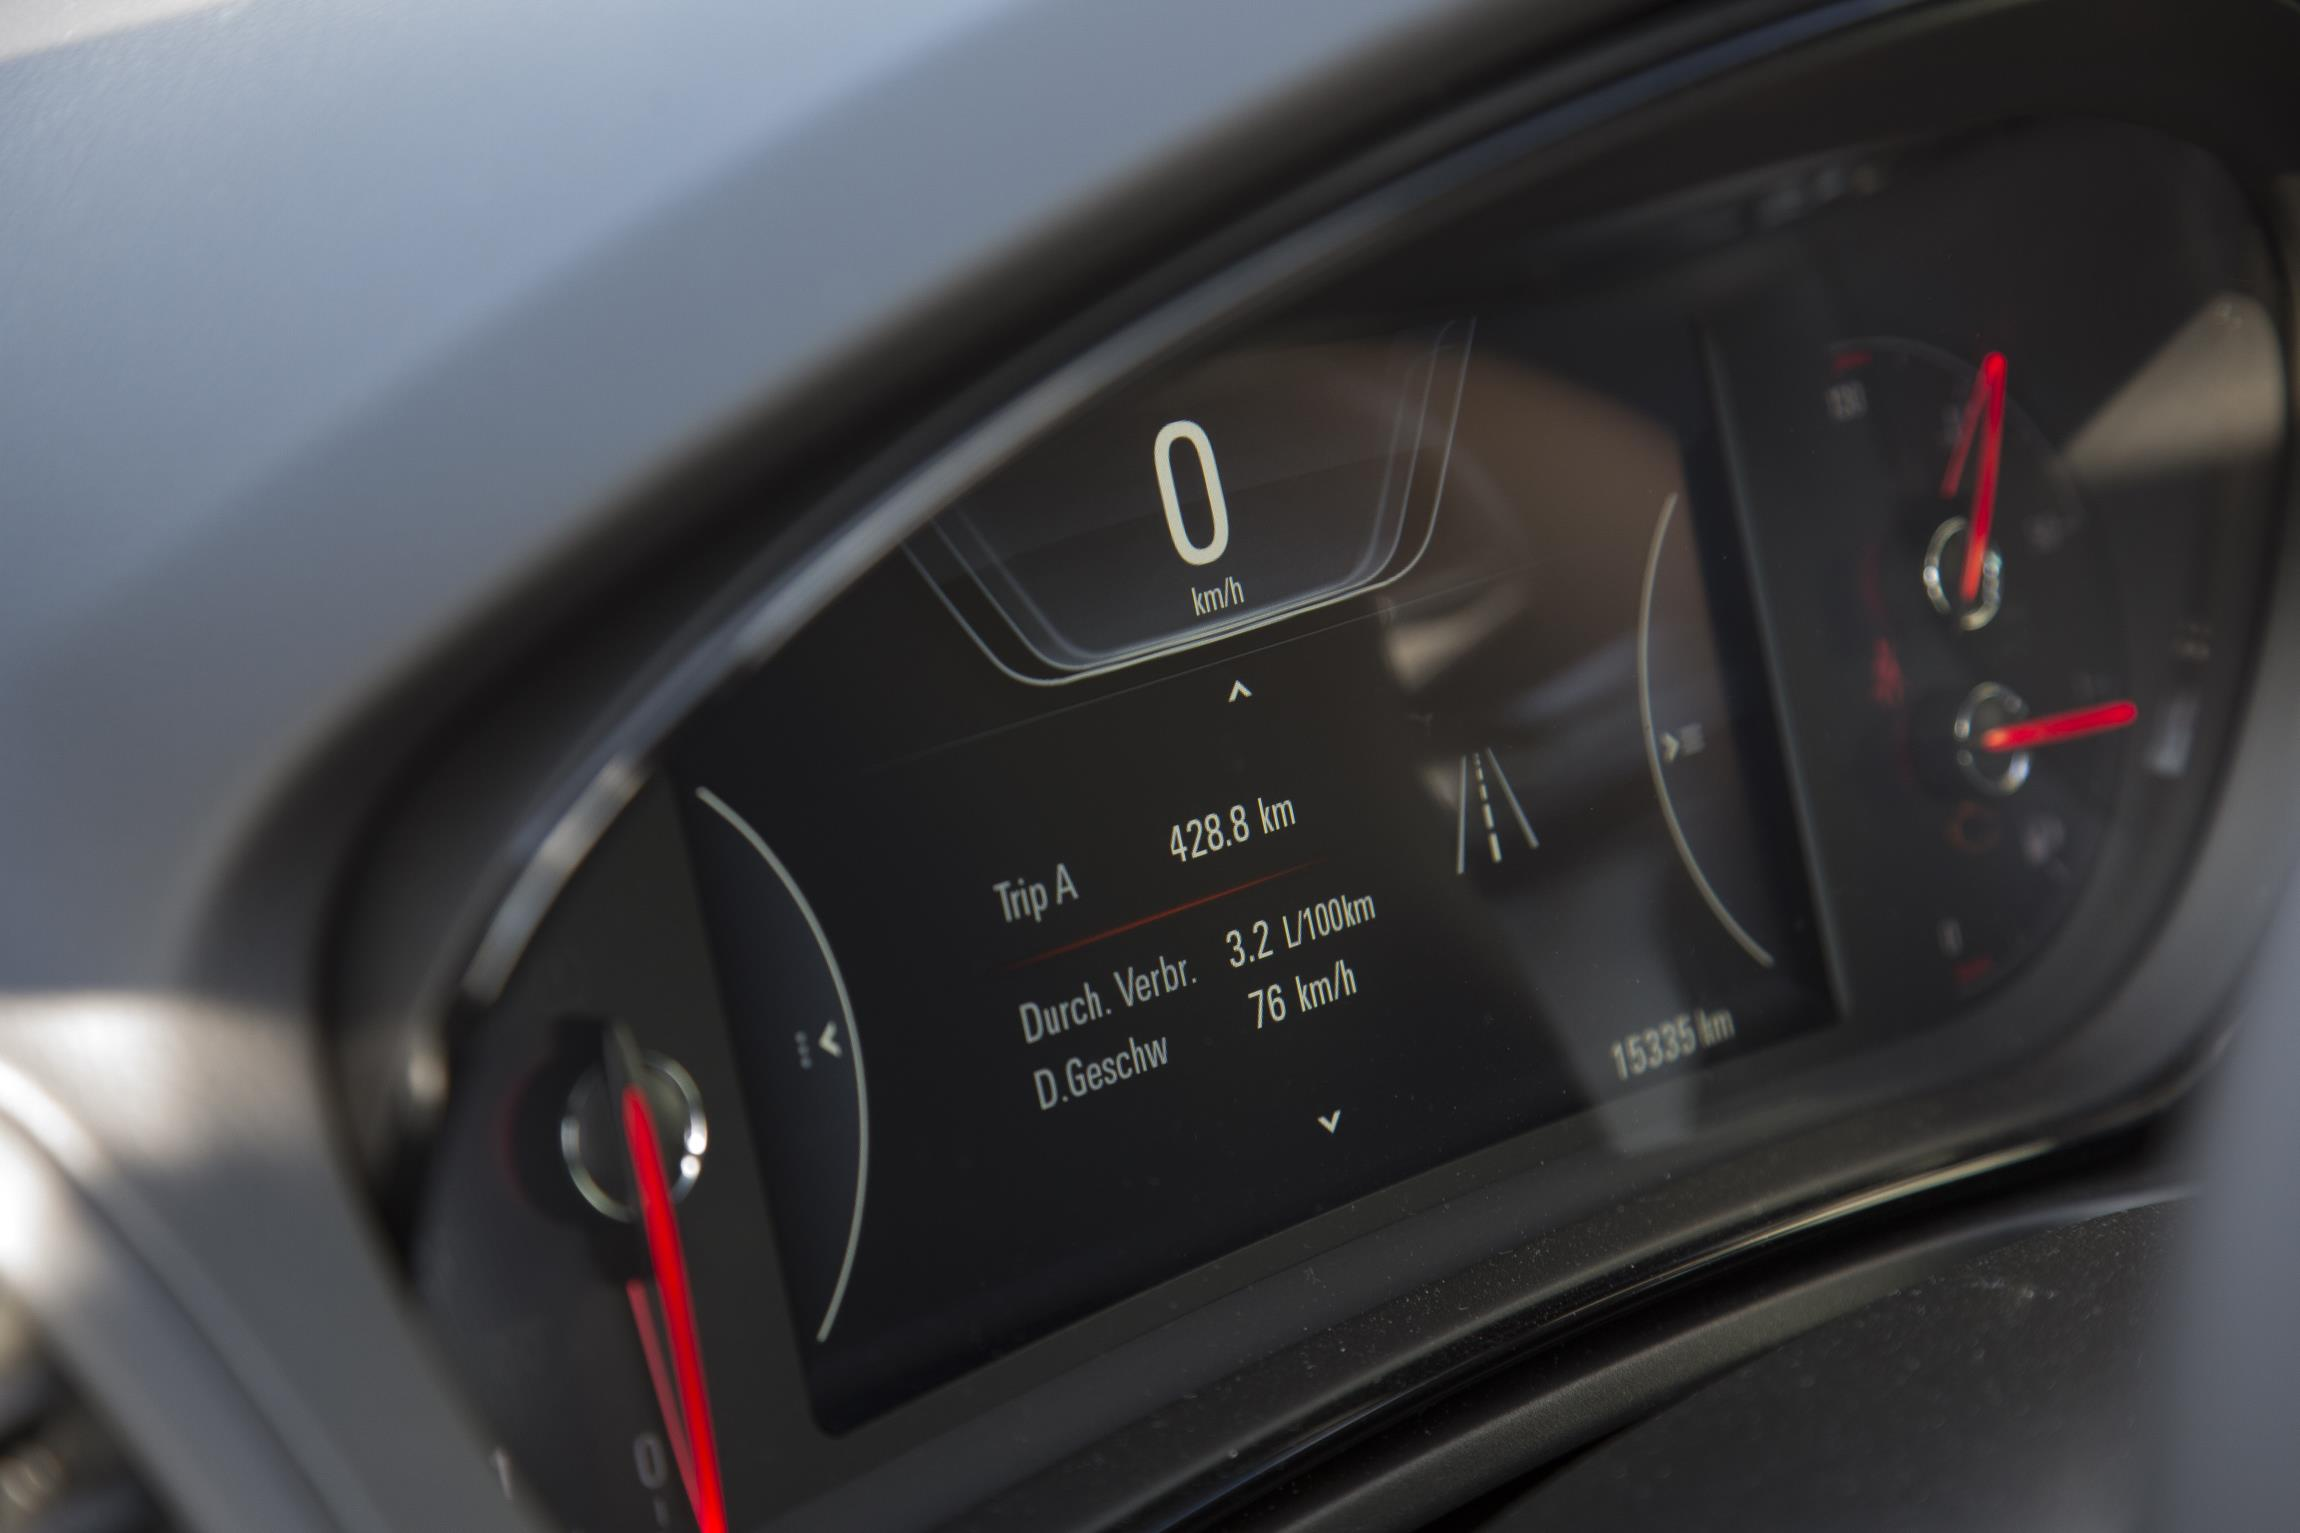 ¡Récord! Un Opel Insignia 1.6 CDTI hace 2.111 kilómetros sin repostar 1